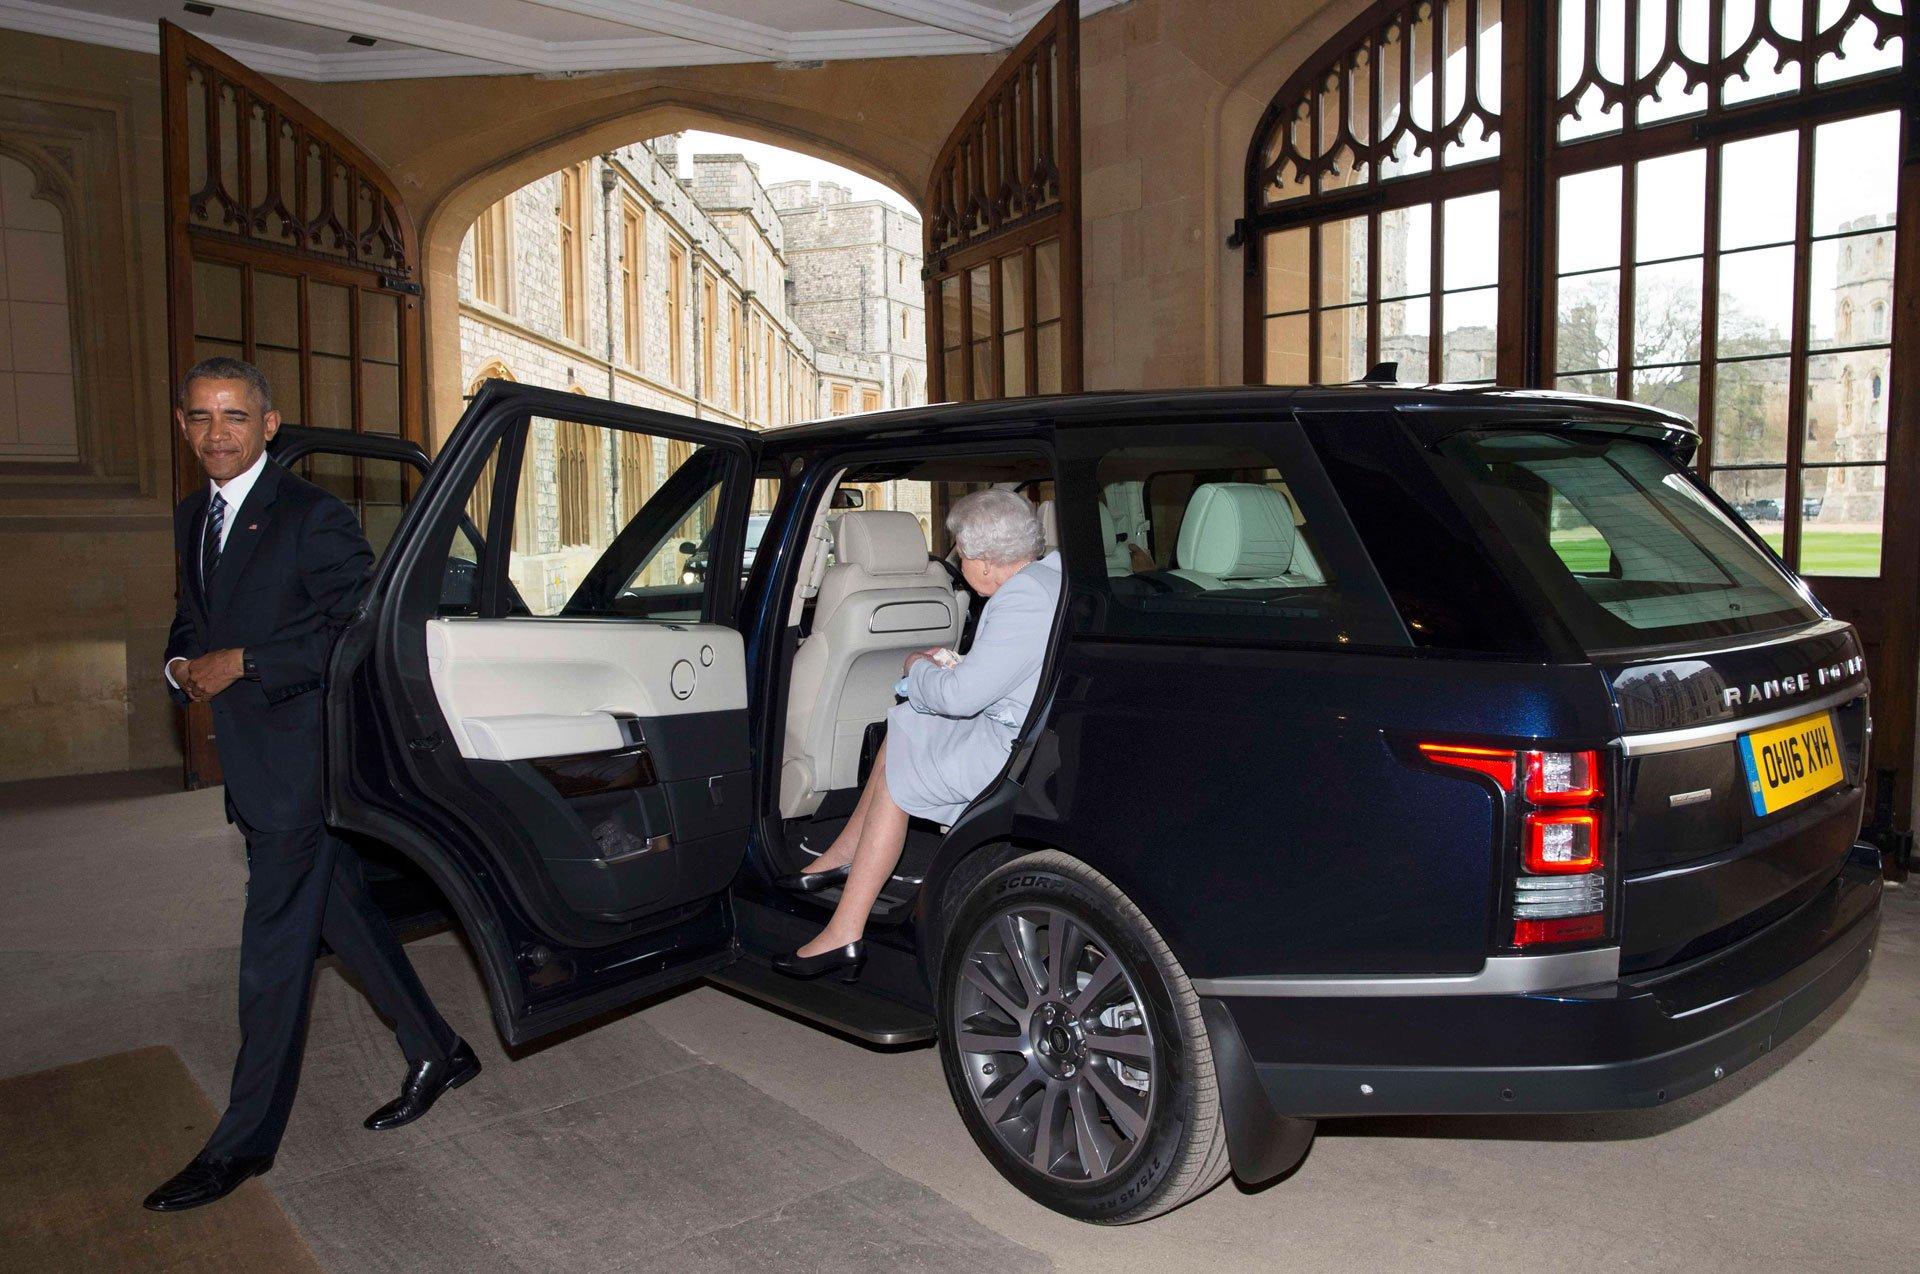 la reina de inglaterra barack obama y la primera dama con un chofer de lujo. Black Bedroom Furniture Sets. Home Design Ideas